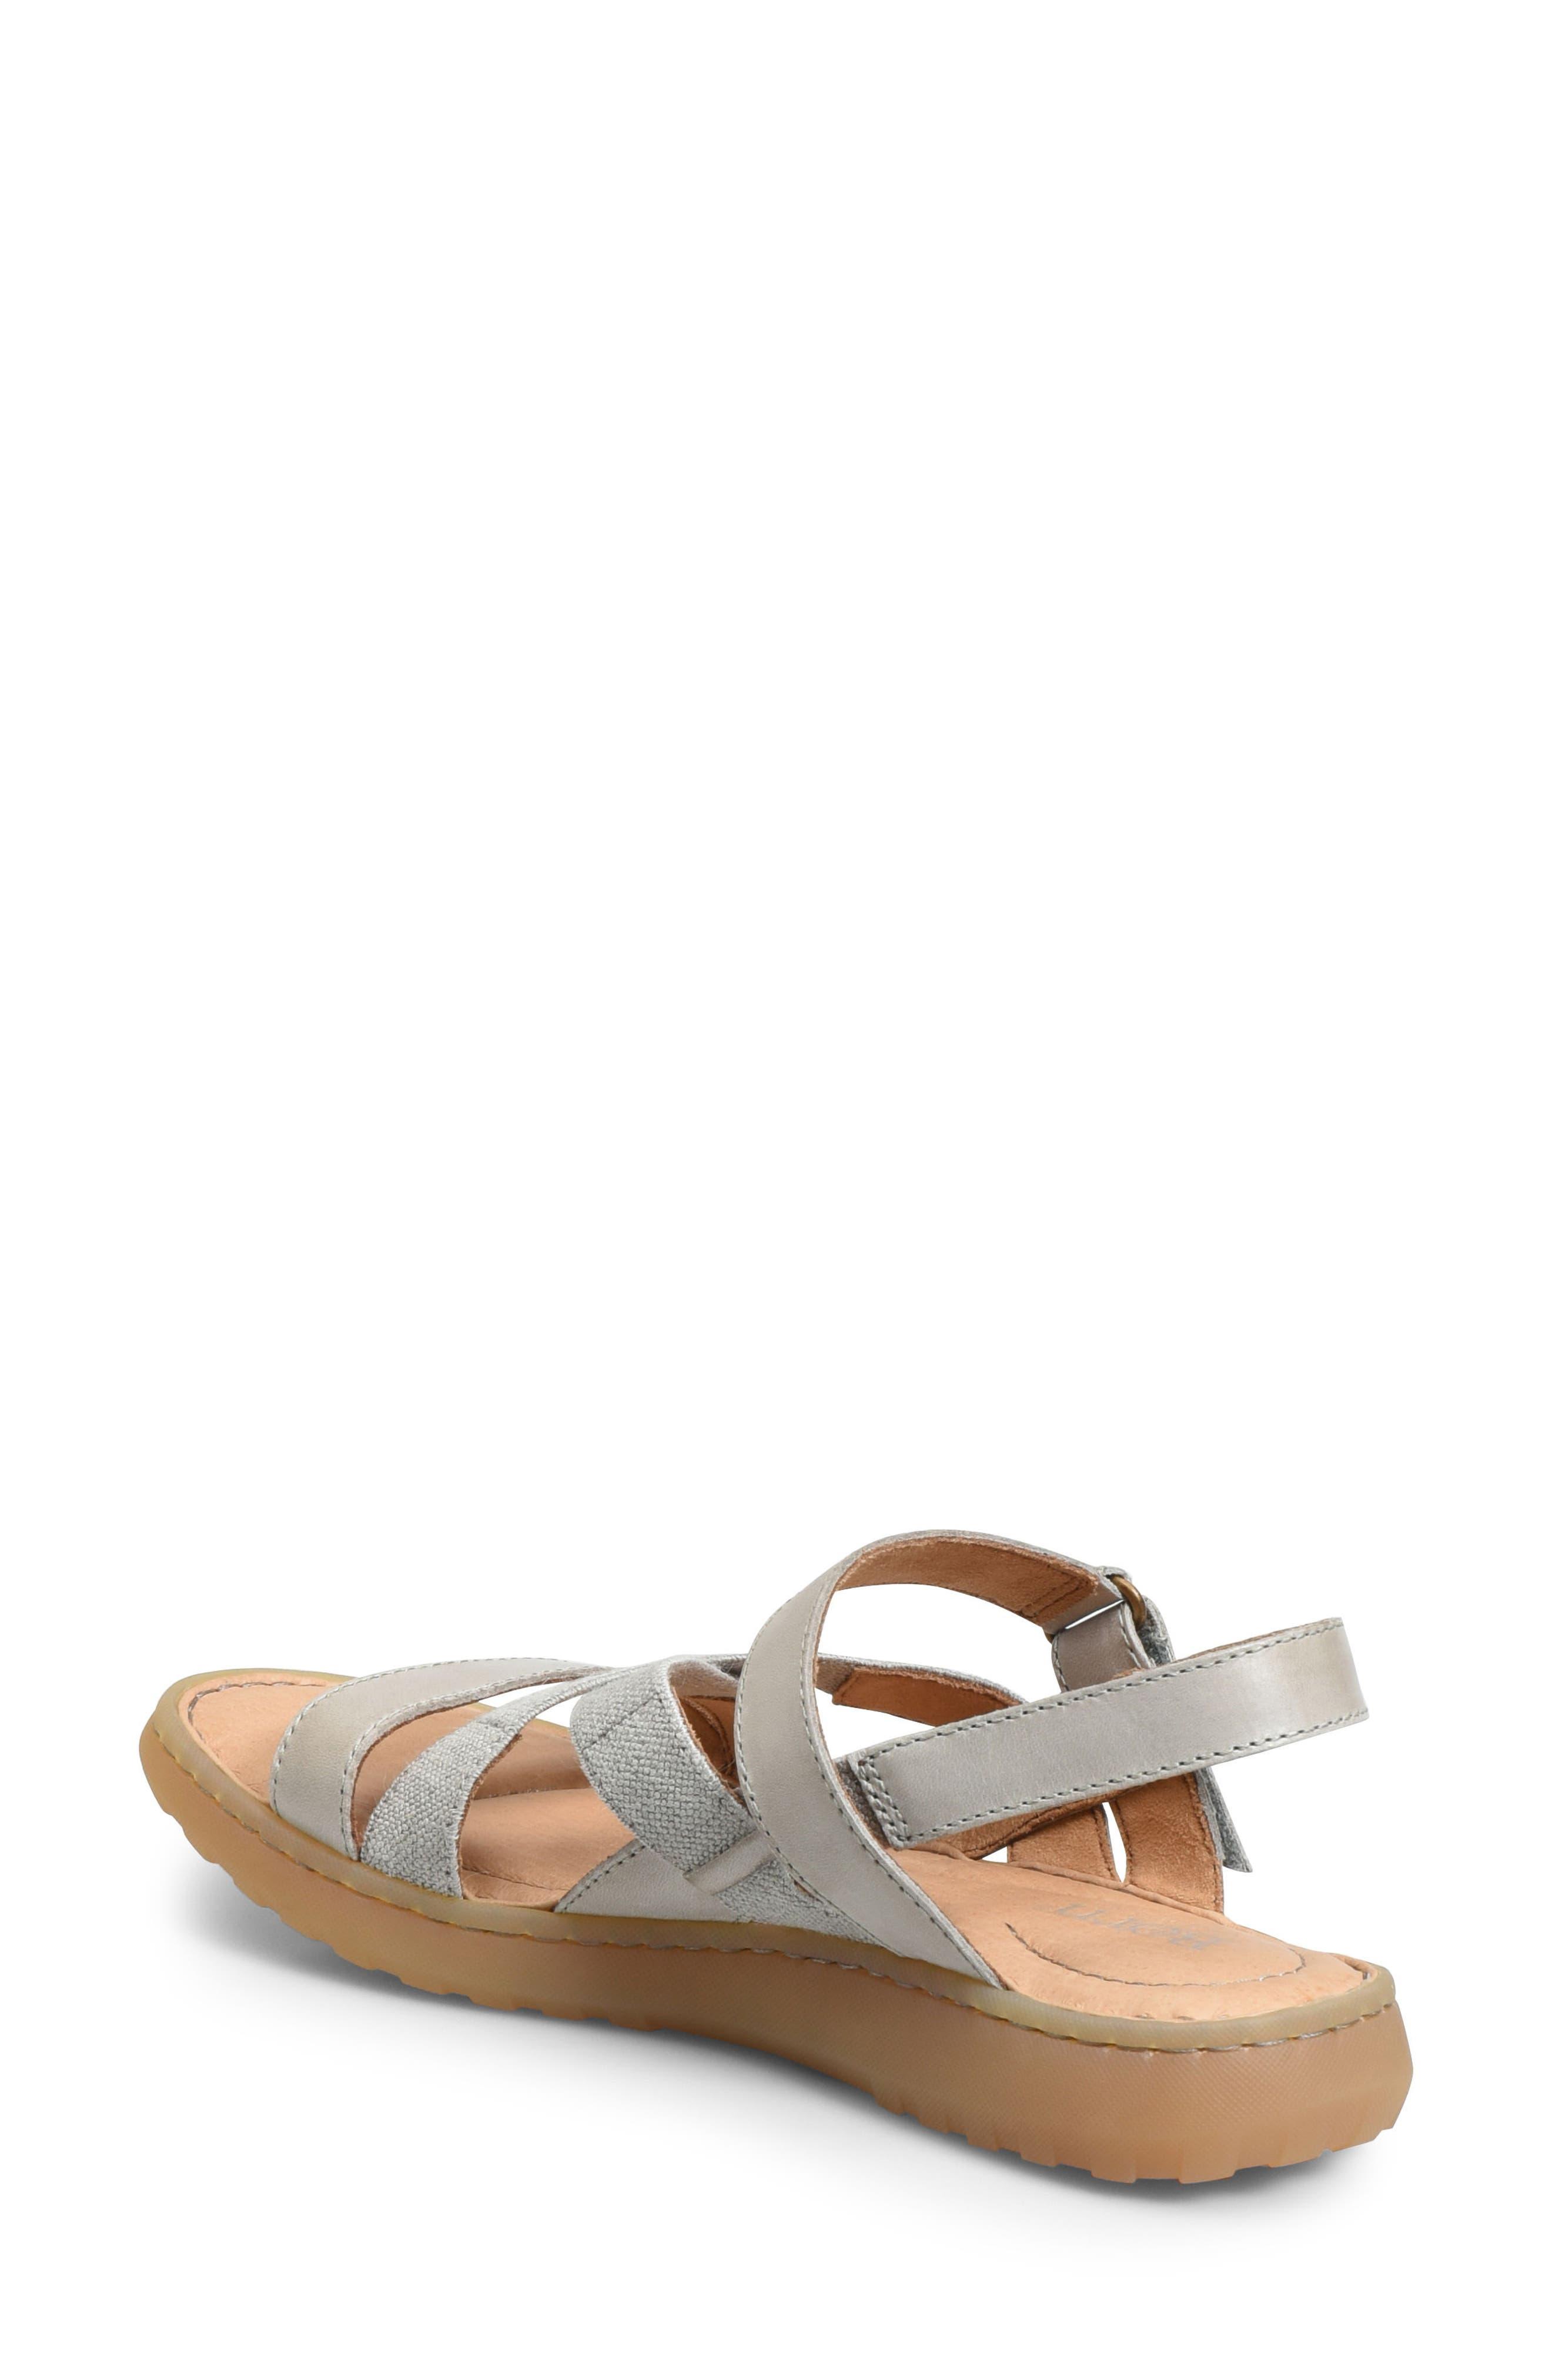 Manta Sandal,                             Alternate thumbnail 2, color,                             Light Grey Leather